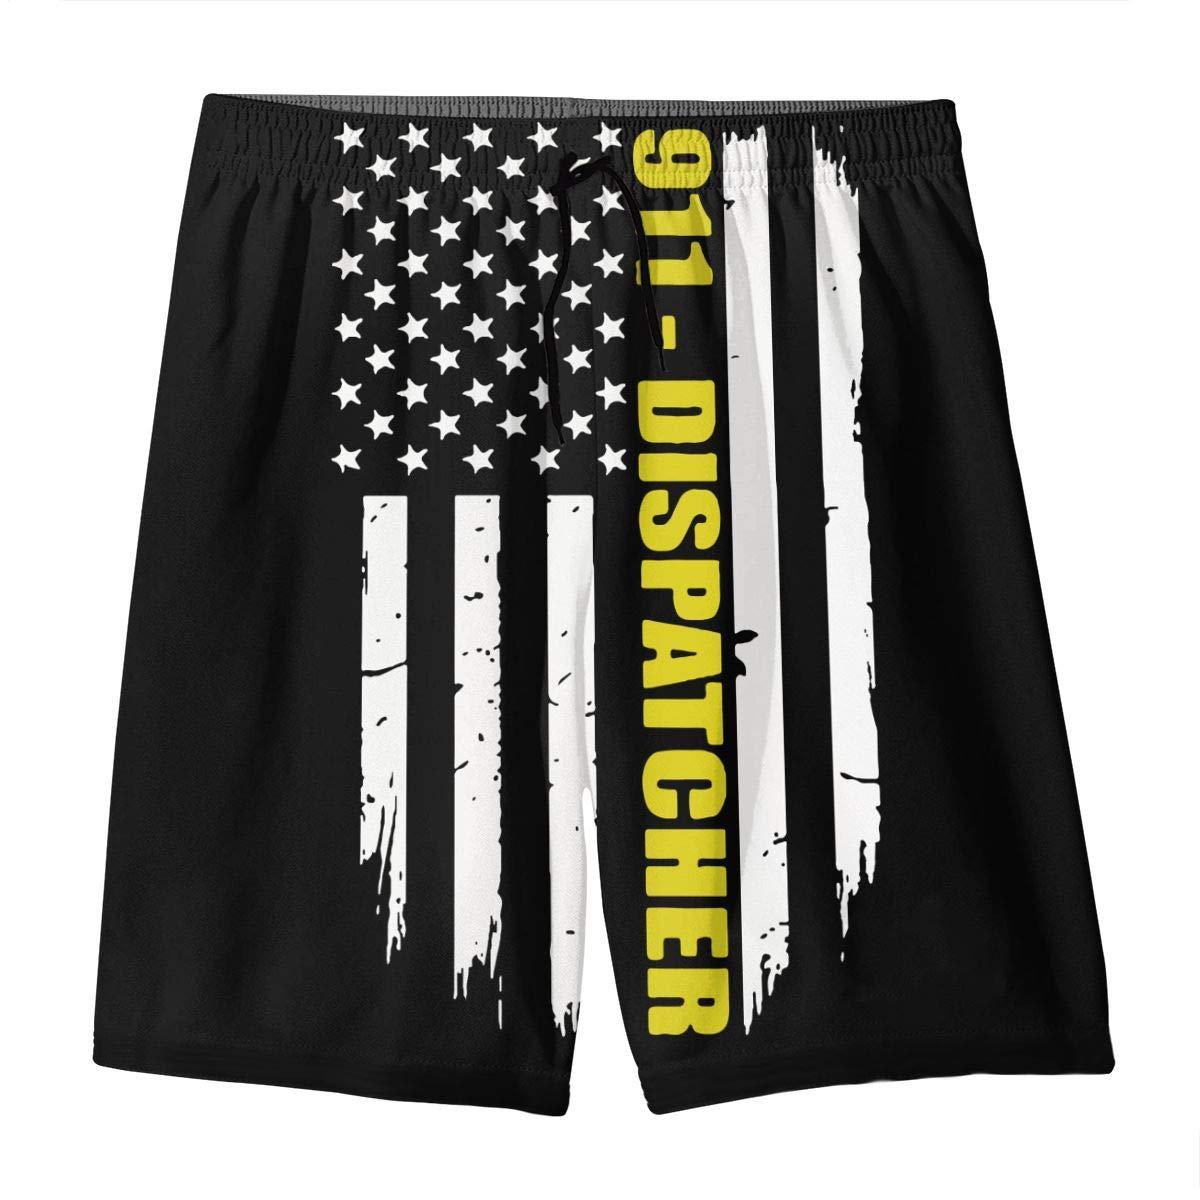 OPQRSTQ-O 911 Dispatcher Gift Thin Gold Line Flag Teenager Mens Sports Beachwear Swimming Shorts Beach Pants